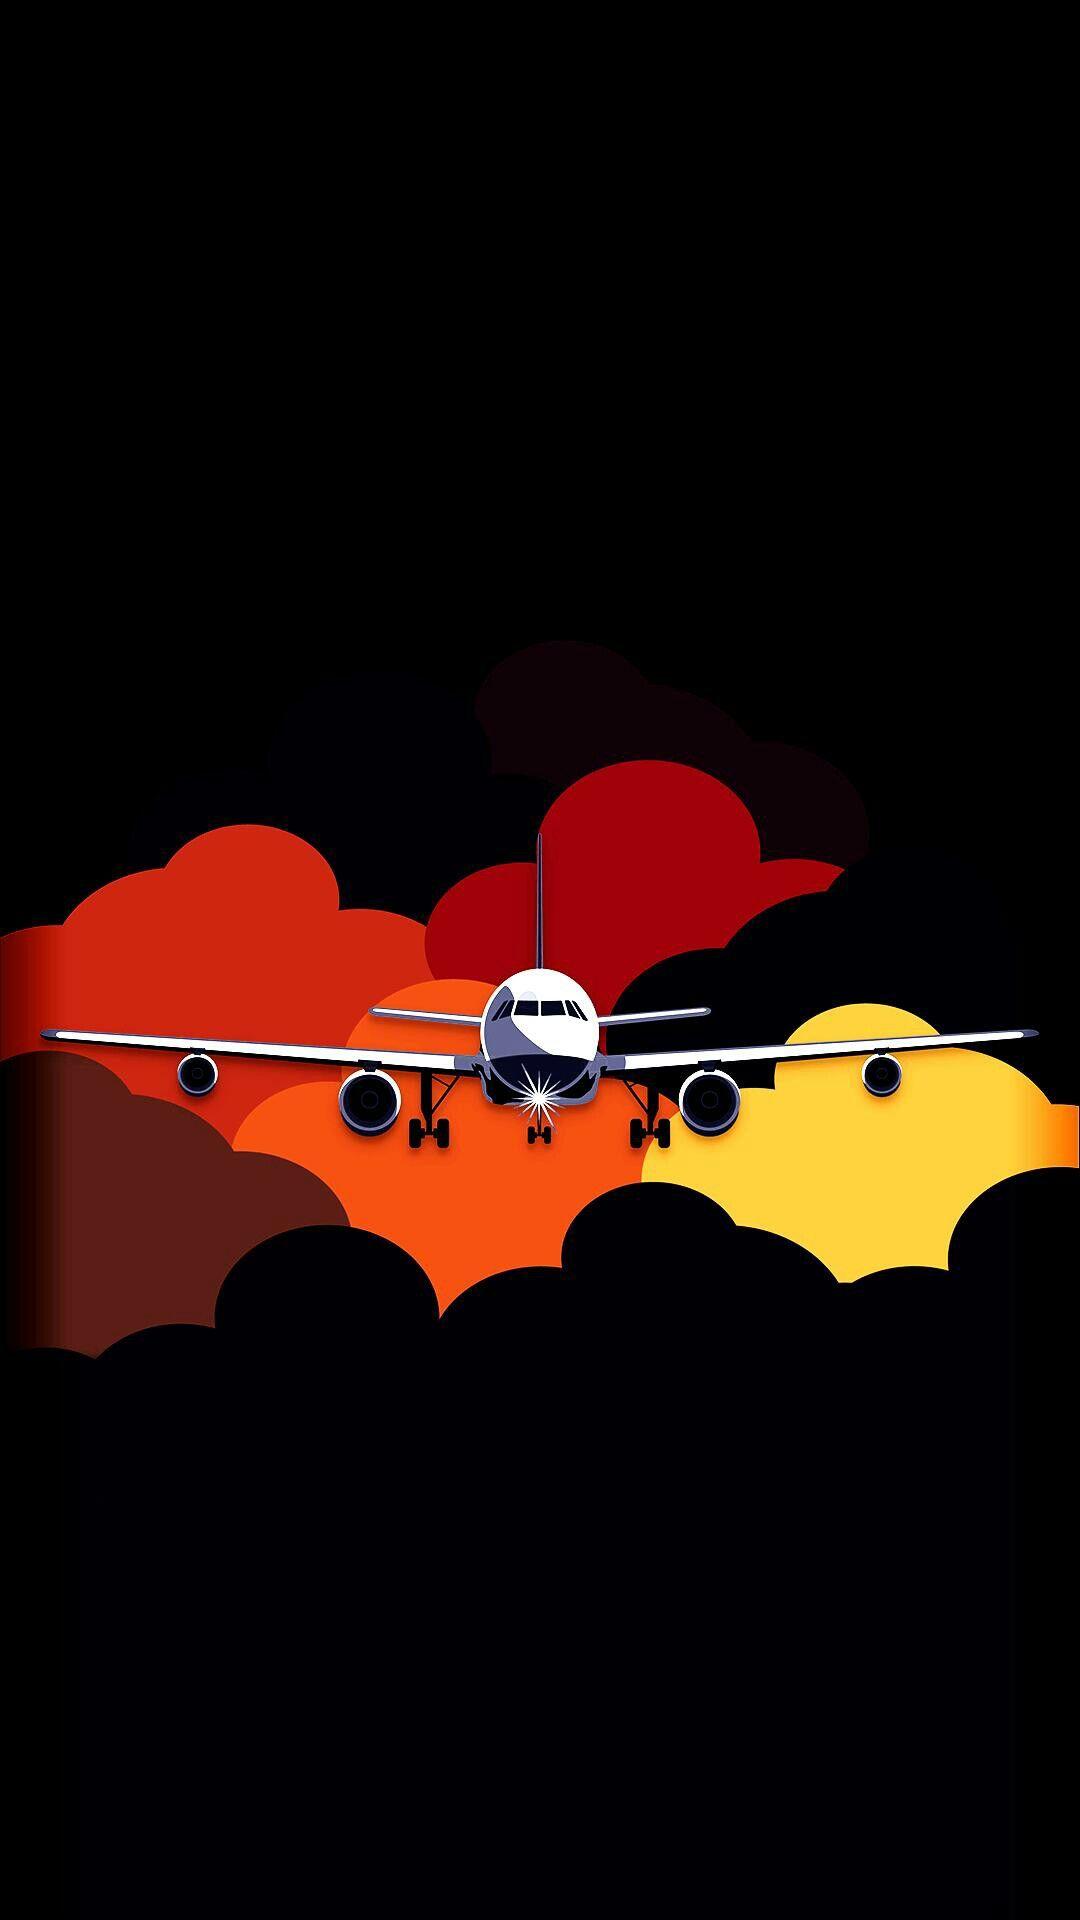 Homescreen And Lockscreen Wallpaper Airplane Airplane Wallpaper Minimal Wallpaper Cellphone Wallpaper